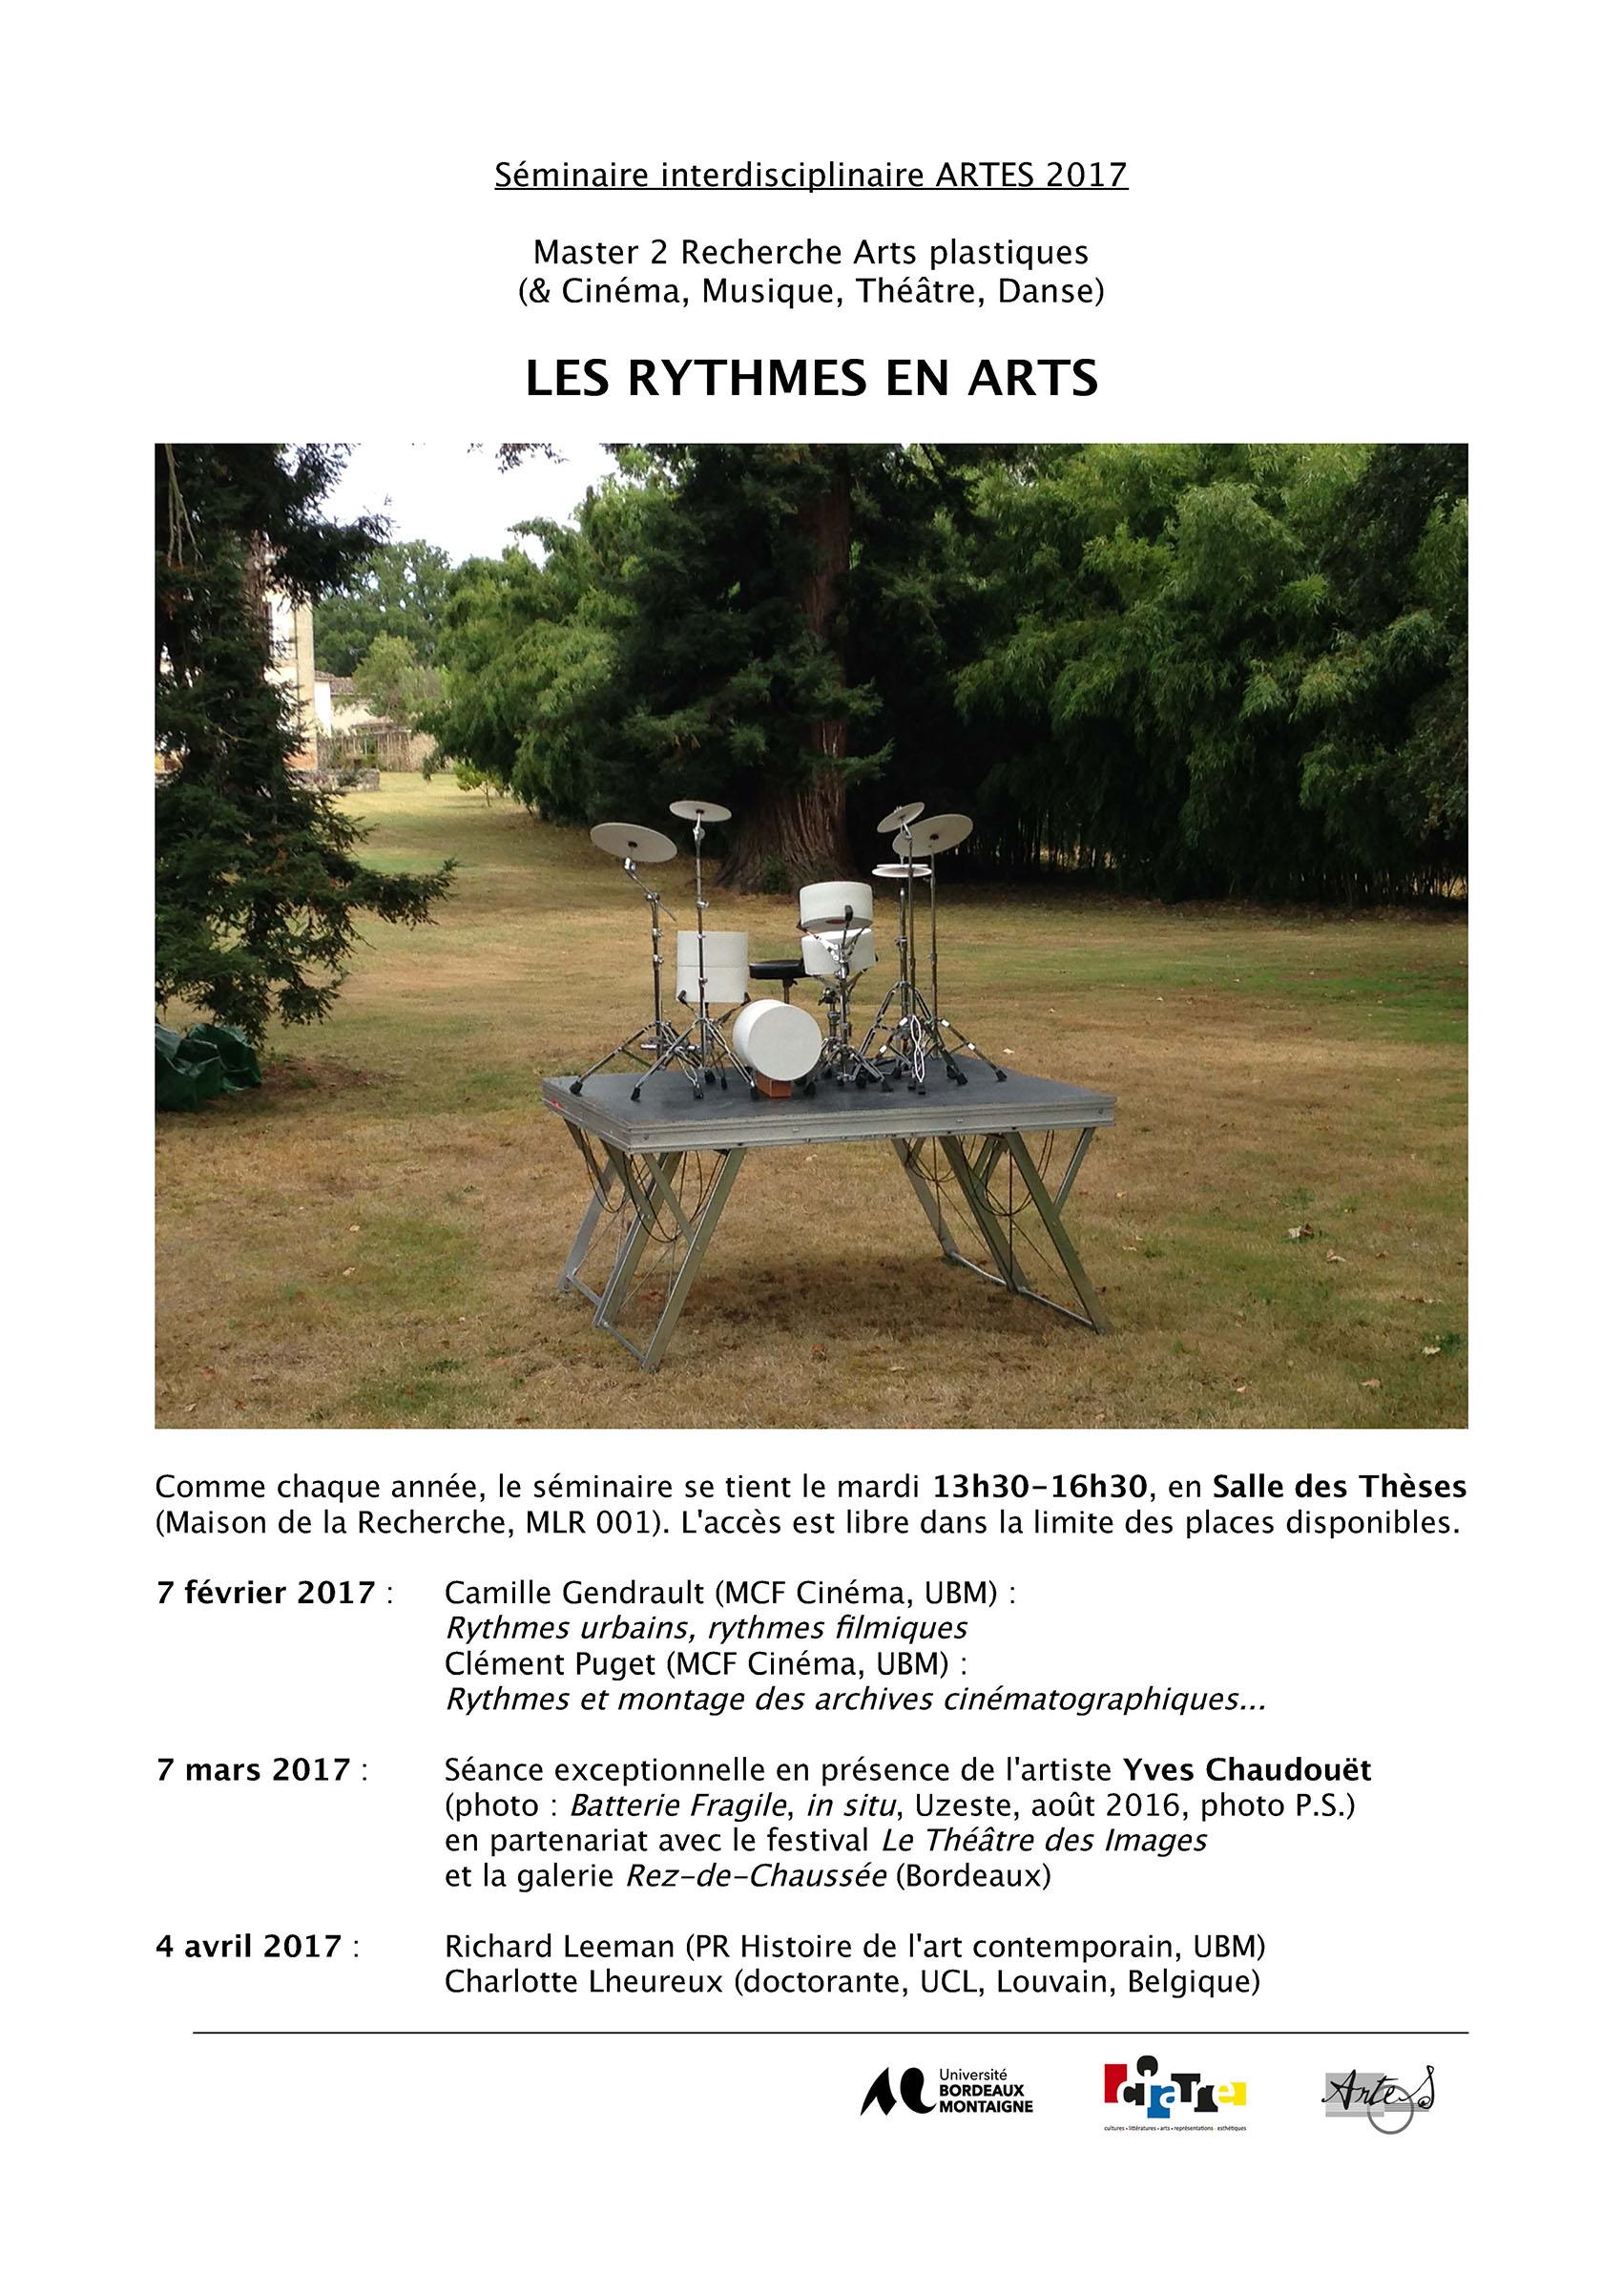 seminaire-artes-rythmes-2017_page_1